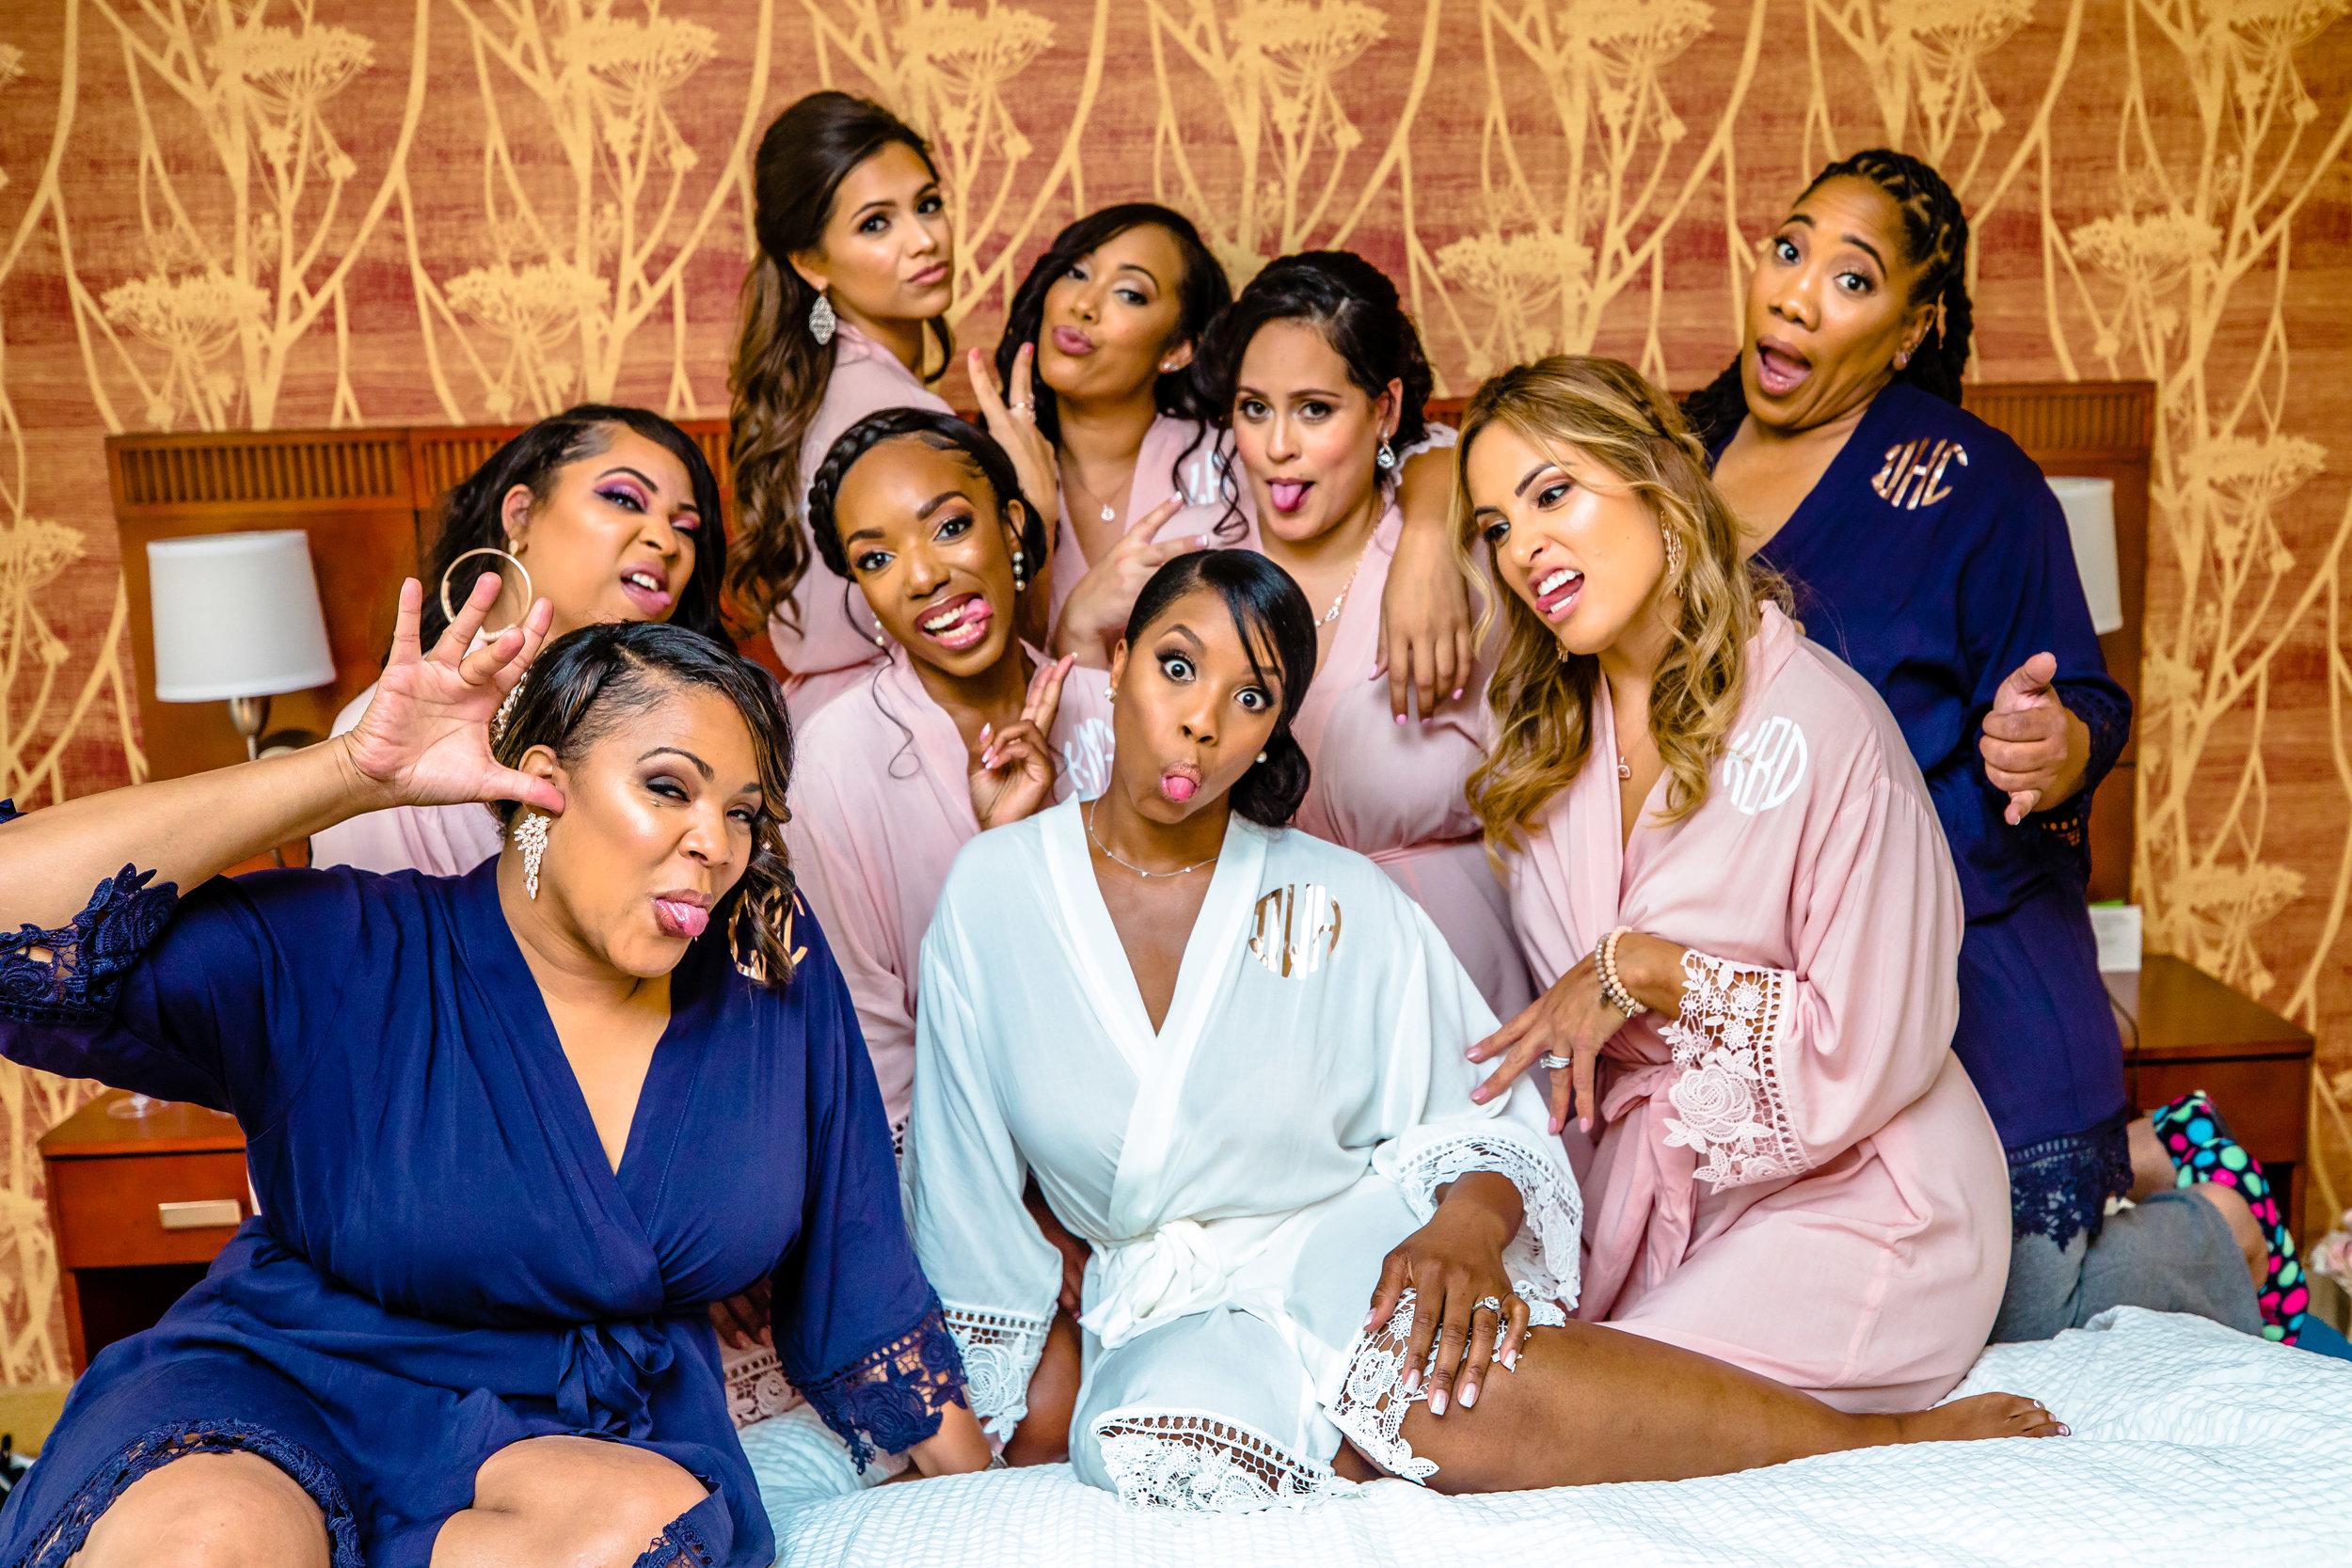 bridesmaids in robes having fun